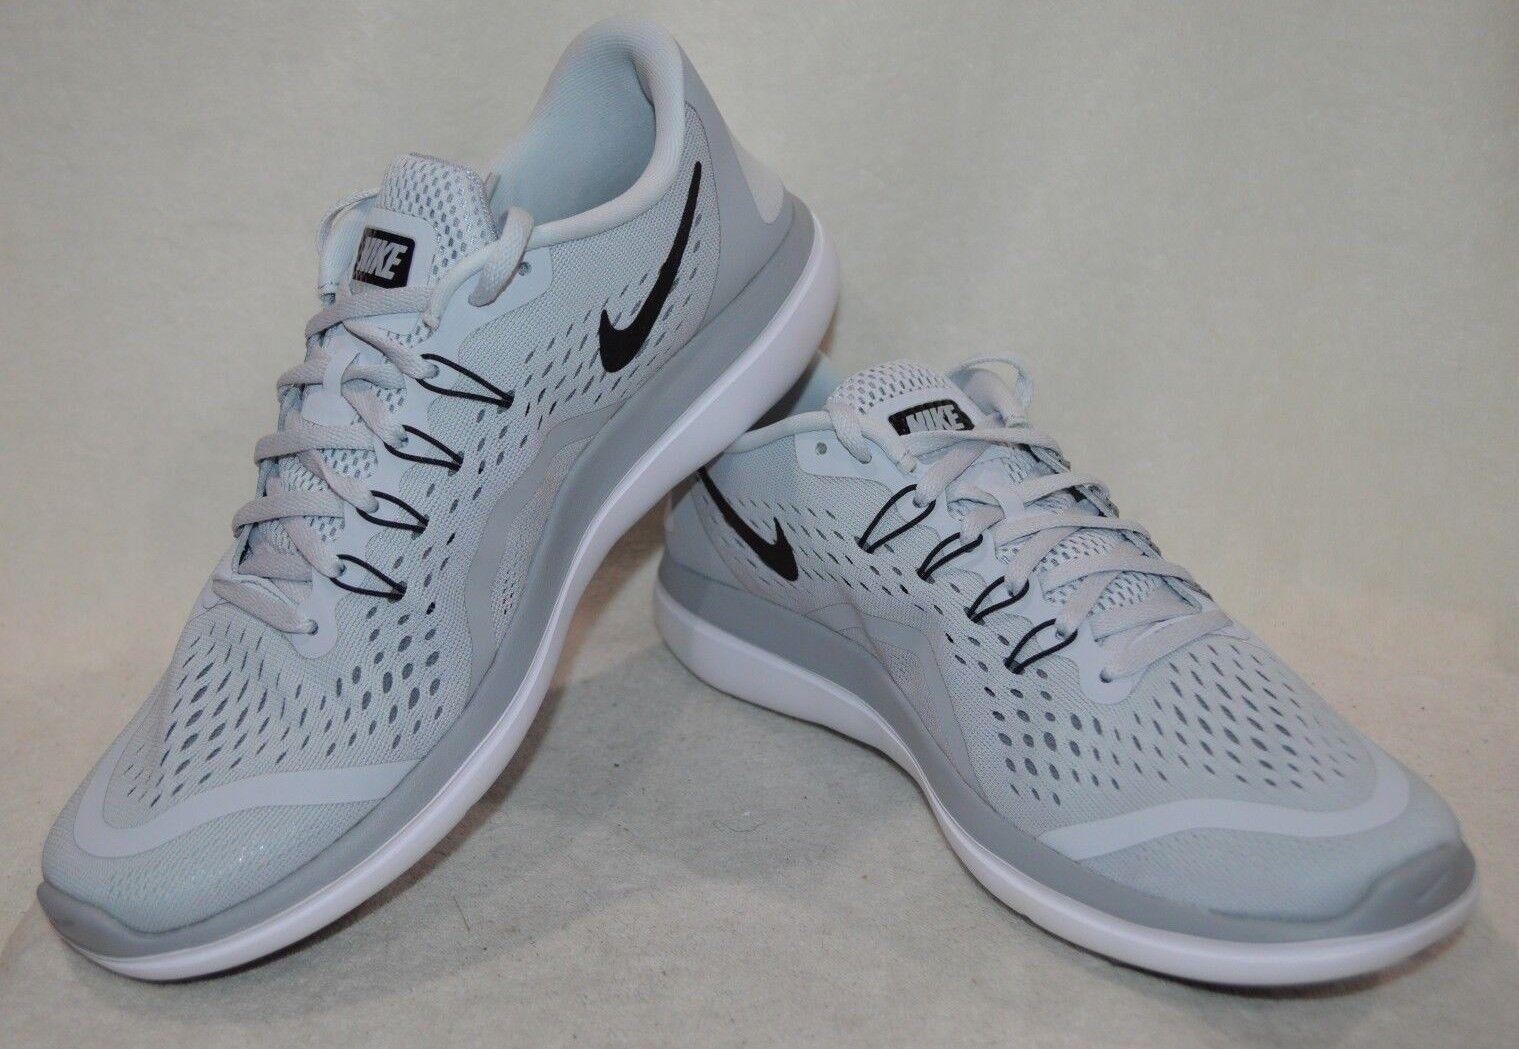 2c29da4f5662 Nike Flex 2017 RN Running Mens Shoes Platinum Grey 898457-002 11.5 ...